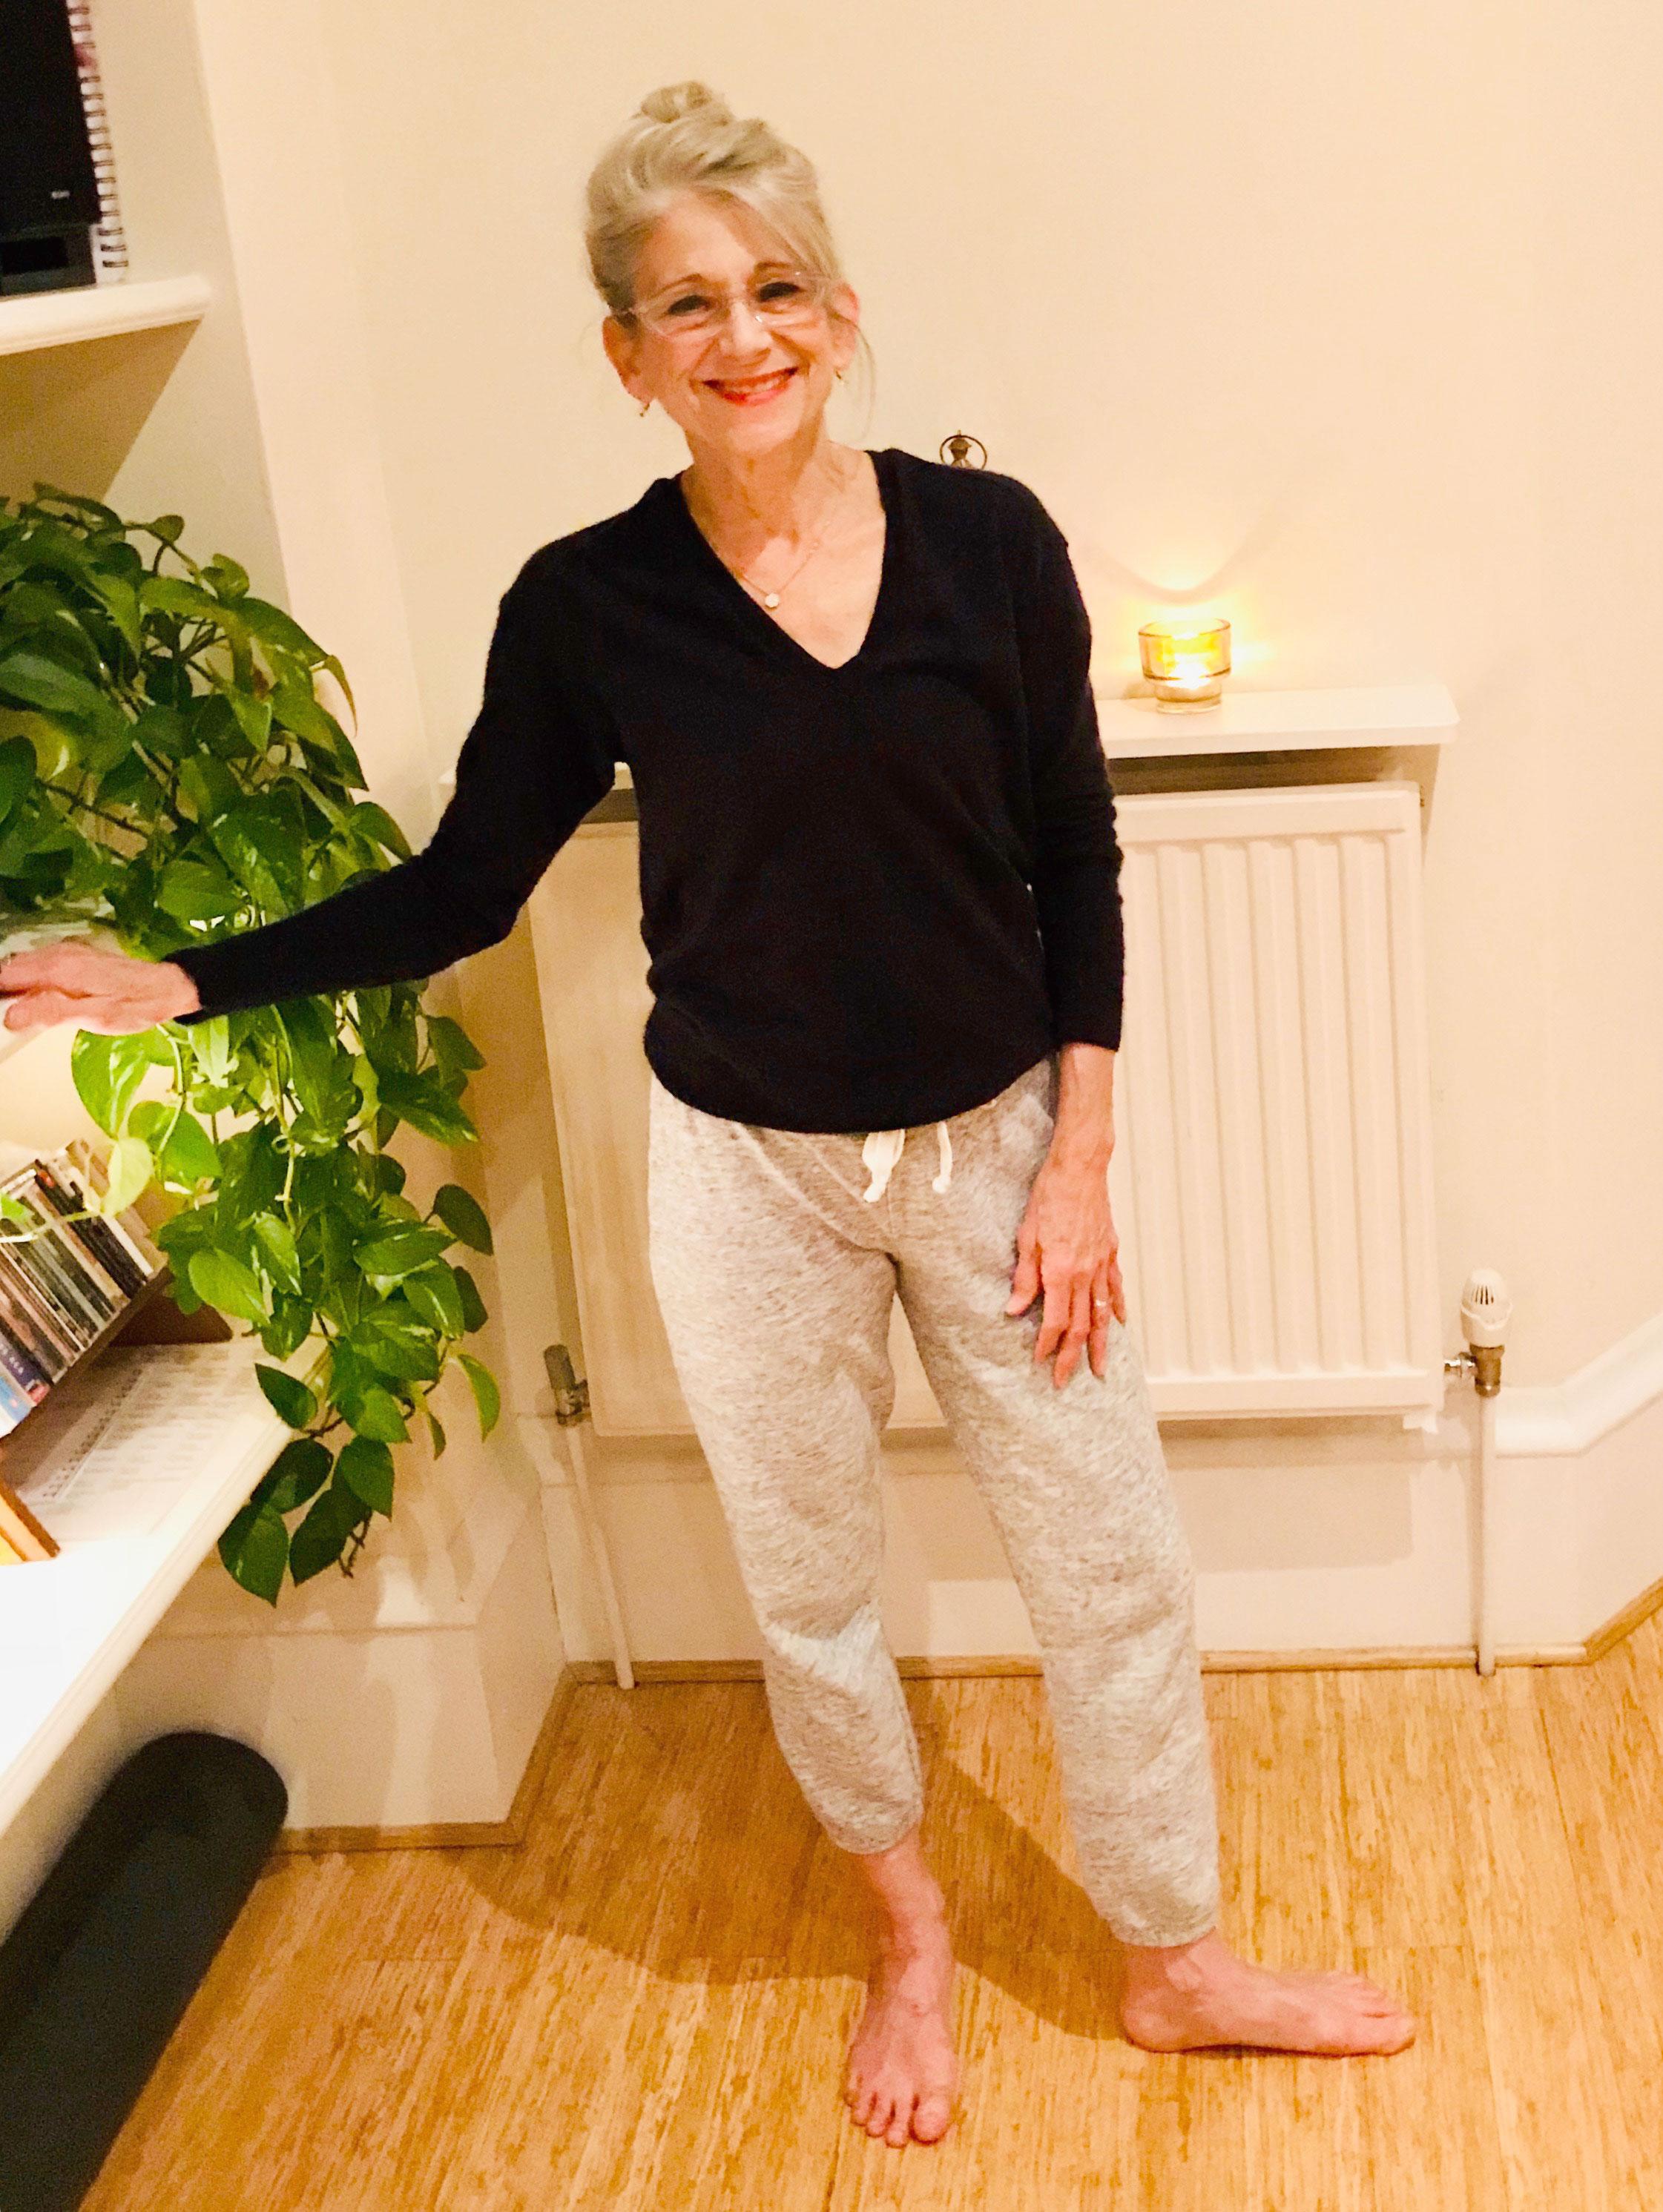 Twenty years later! Mona as Guest Teacher, December 2017, at her sister Laurie Prime's studio, York Yoga, UK.